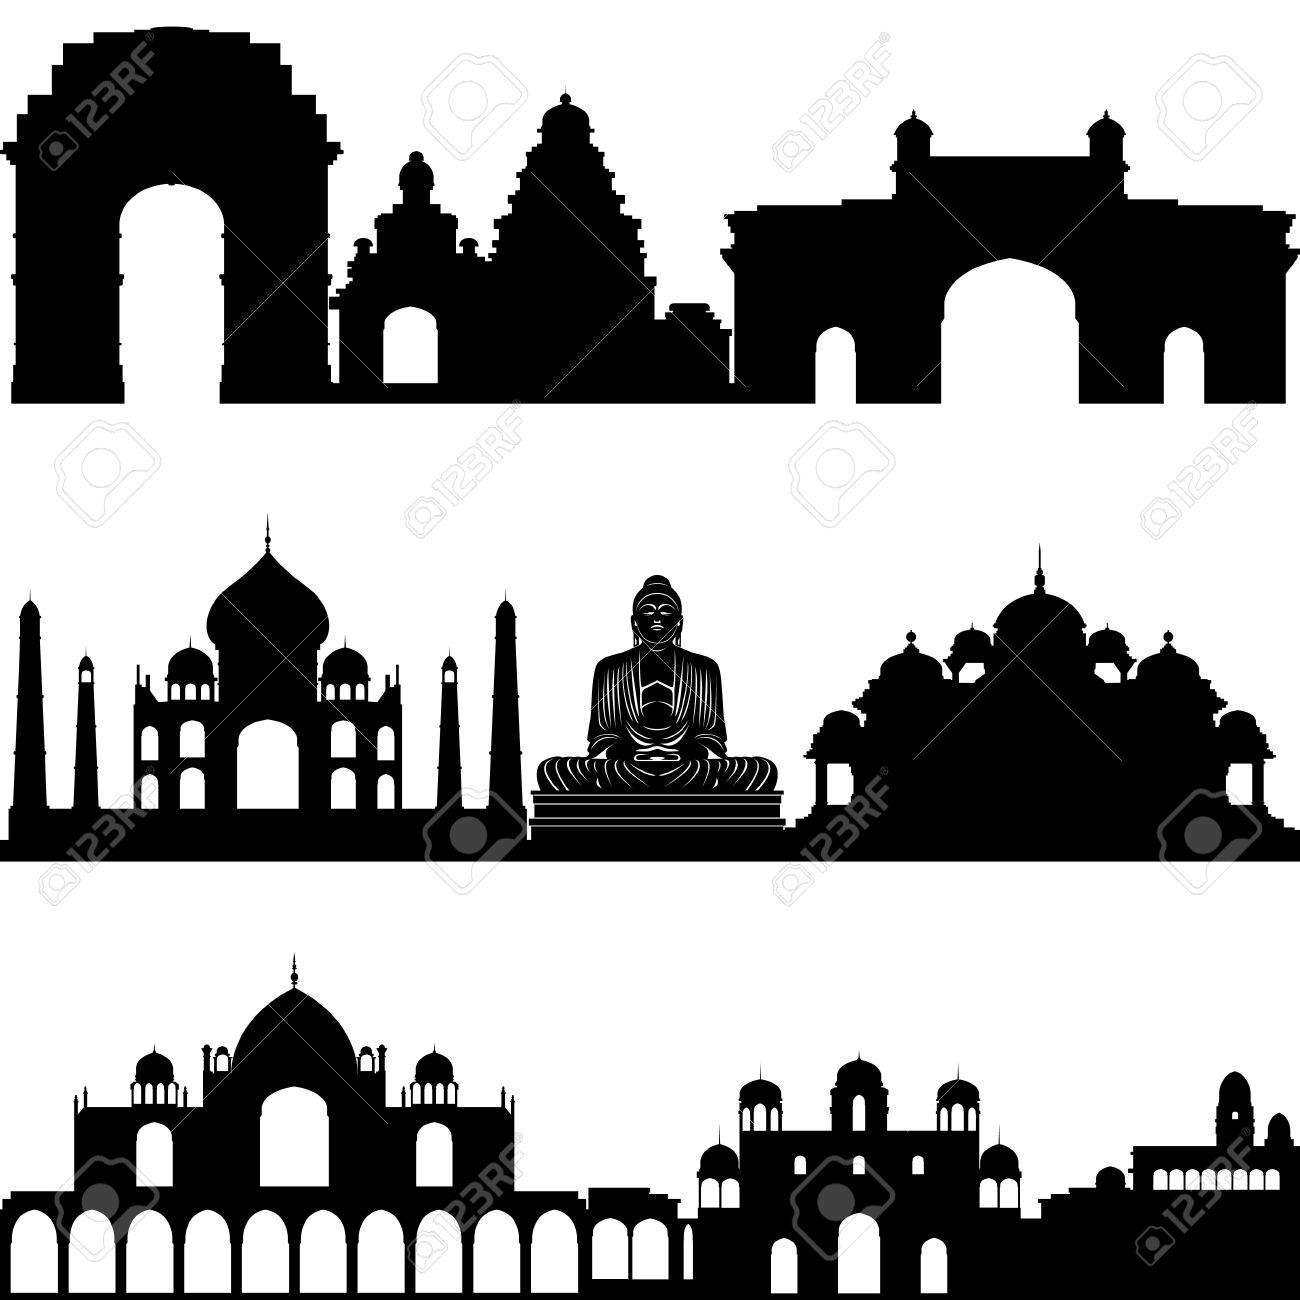 Shivaji fort clipart.